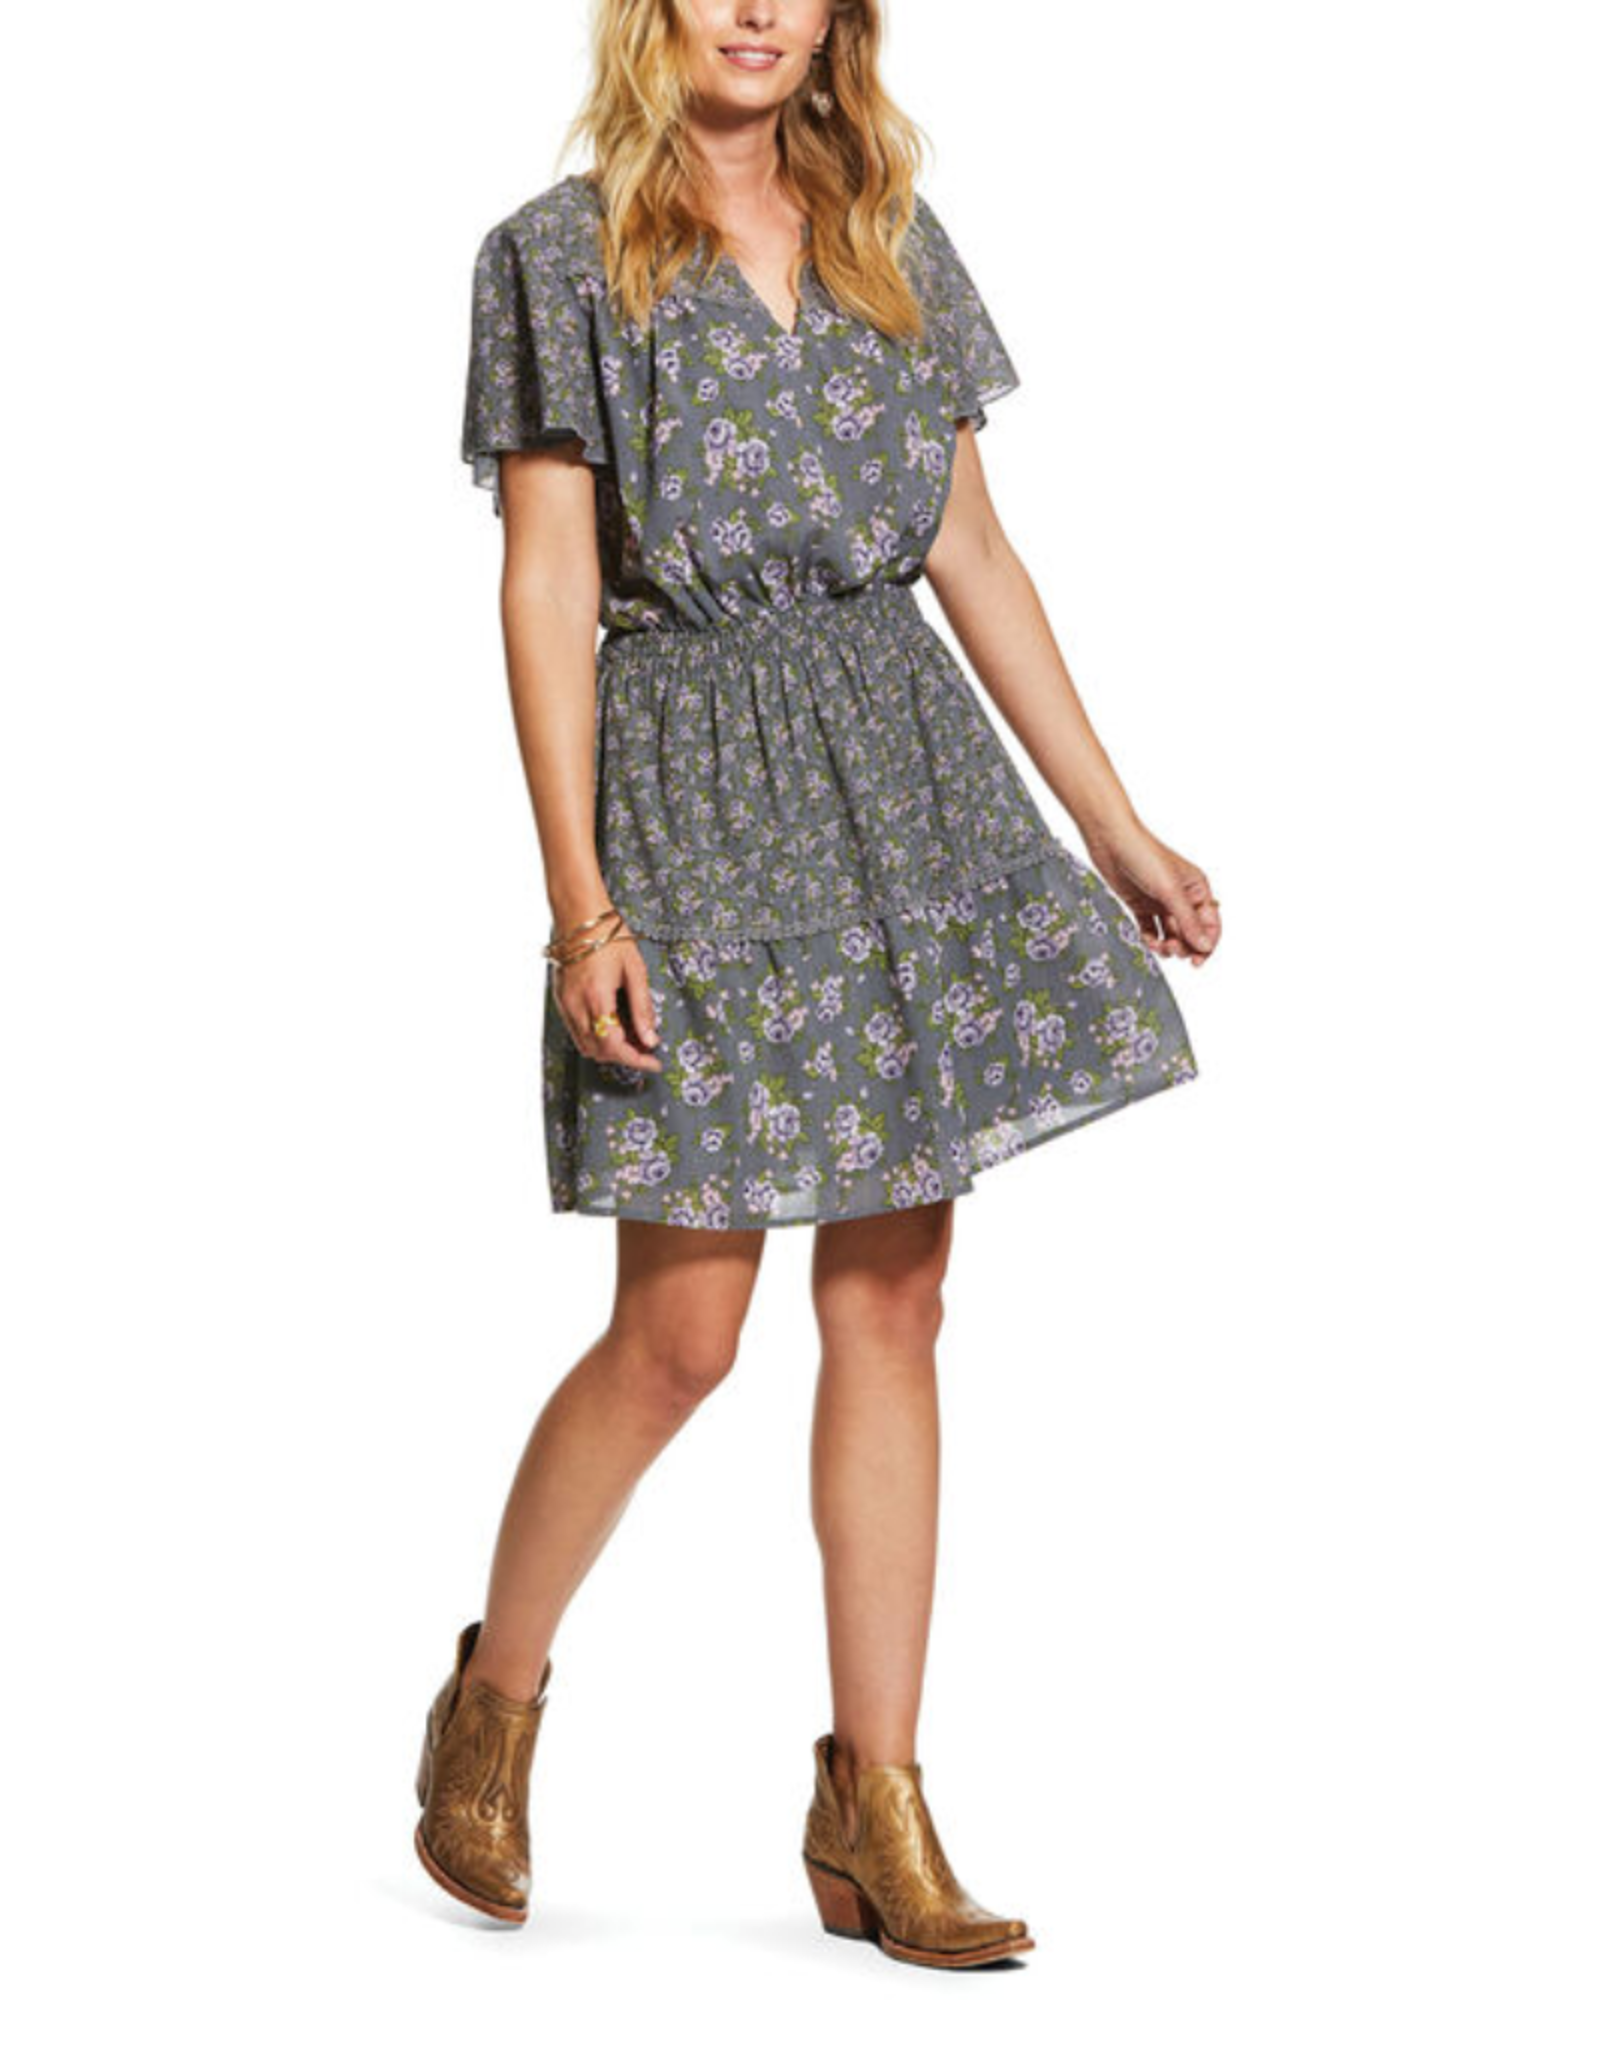 Ariat Ariat Exhale Dress